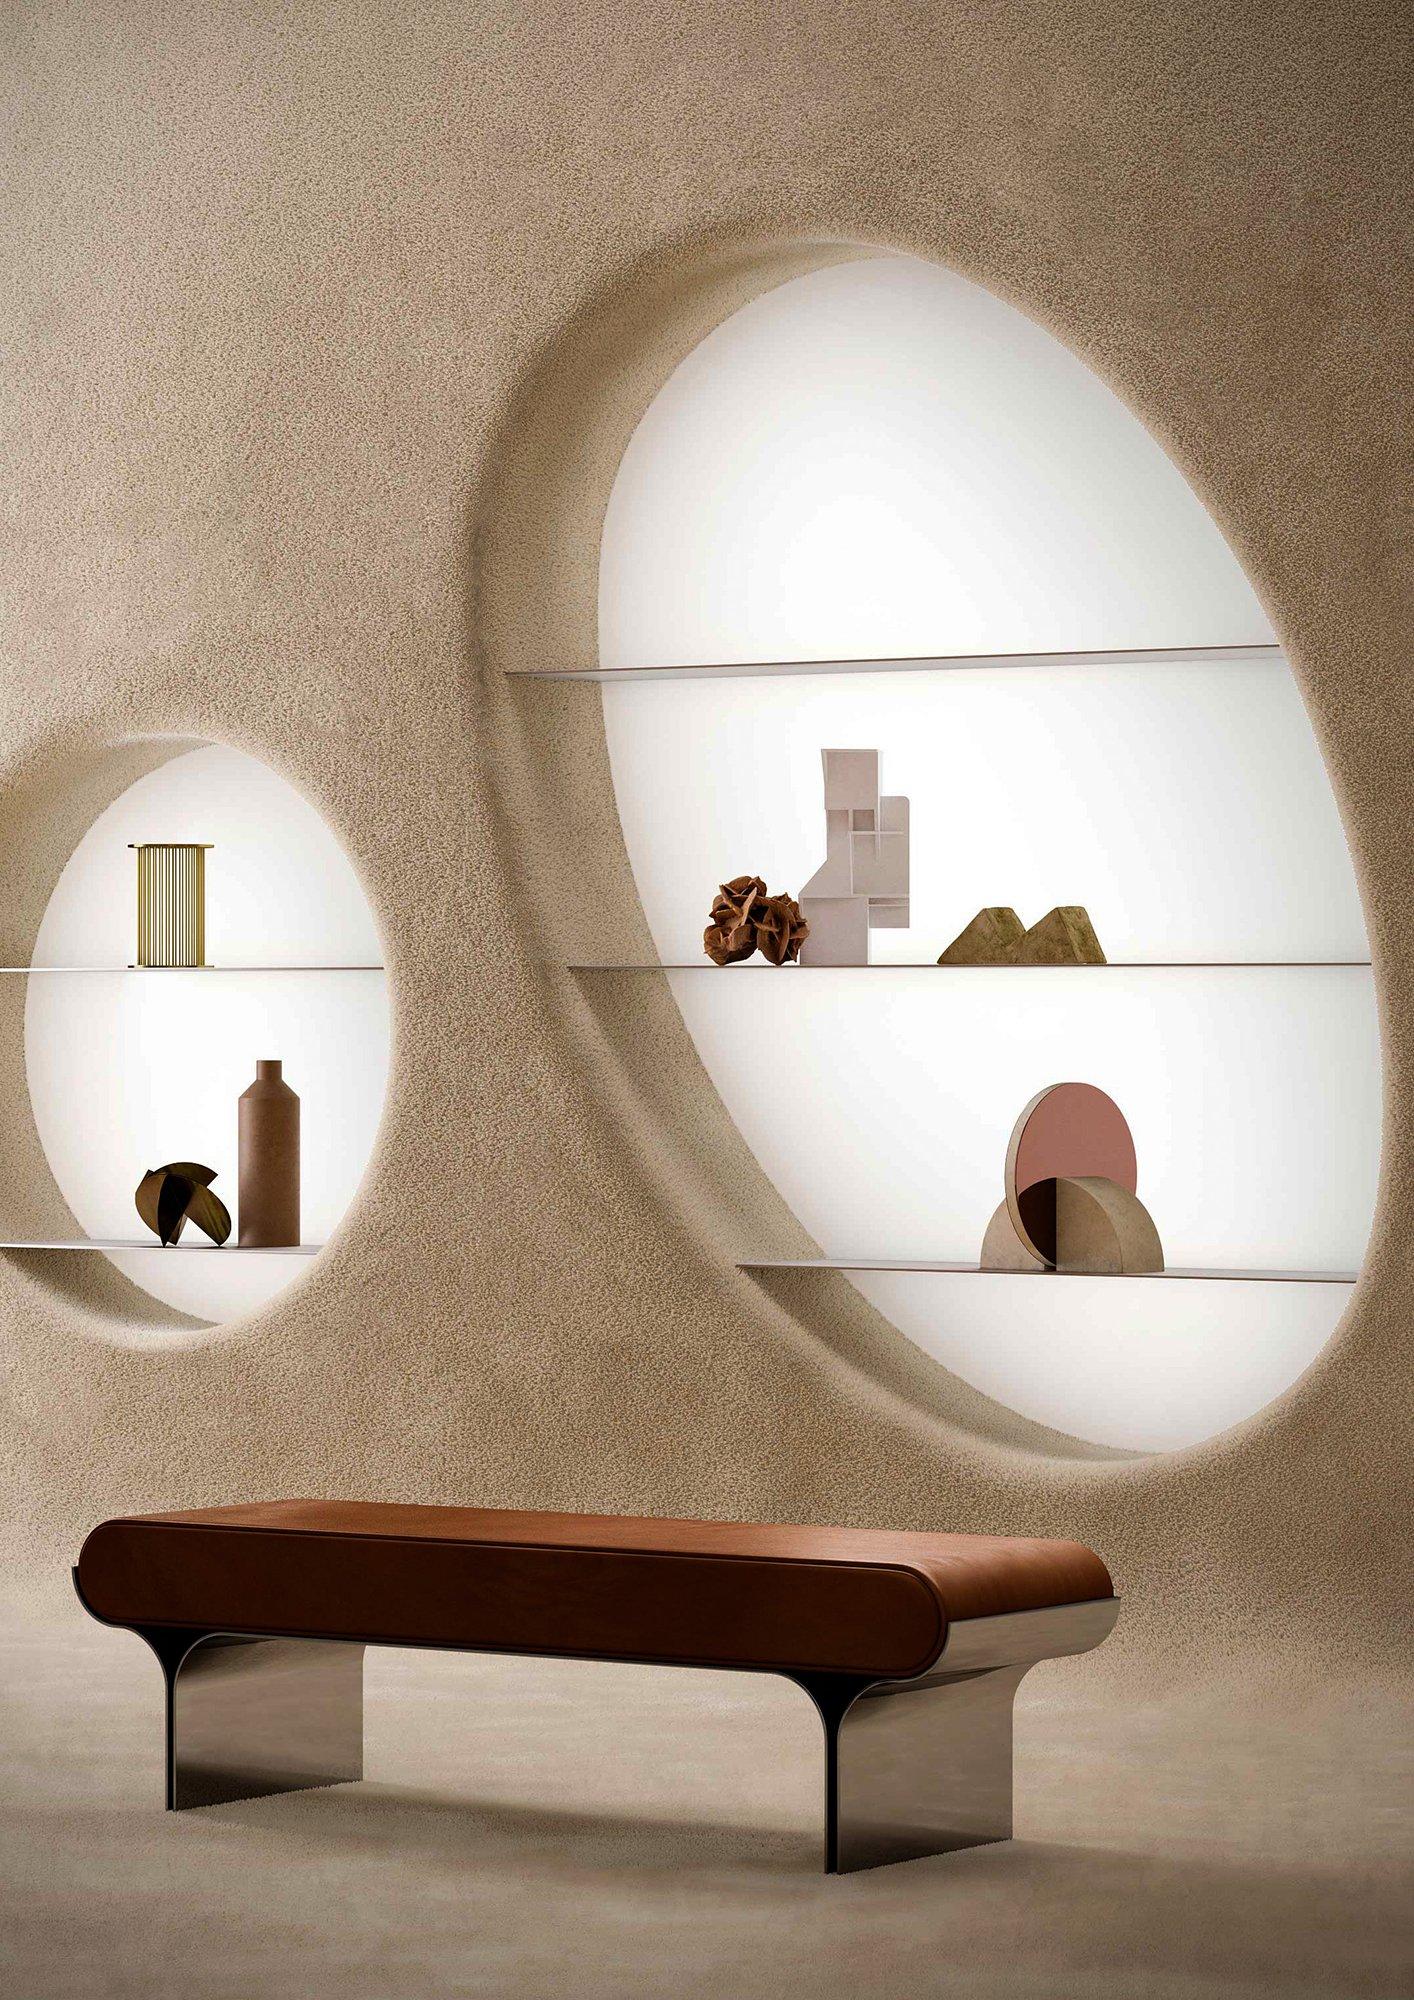 Studiopepe Wunderkammer, images par Terzo Piano